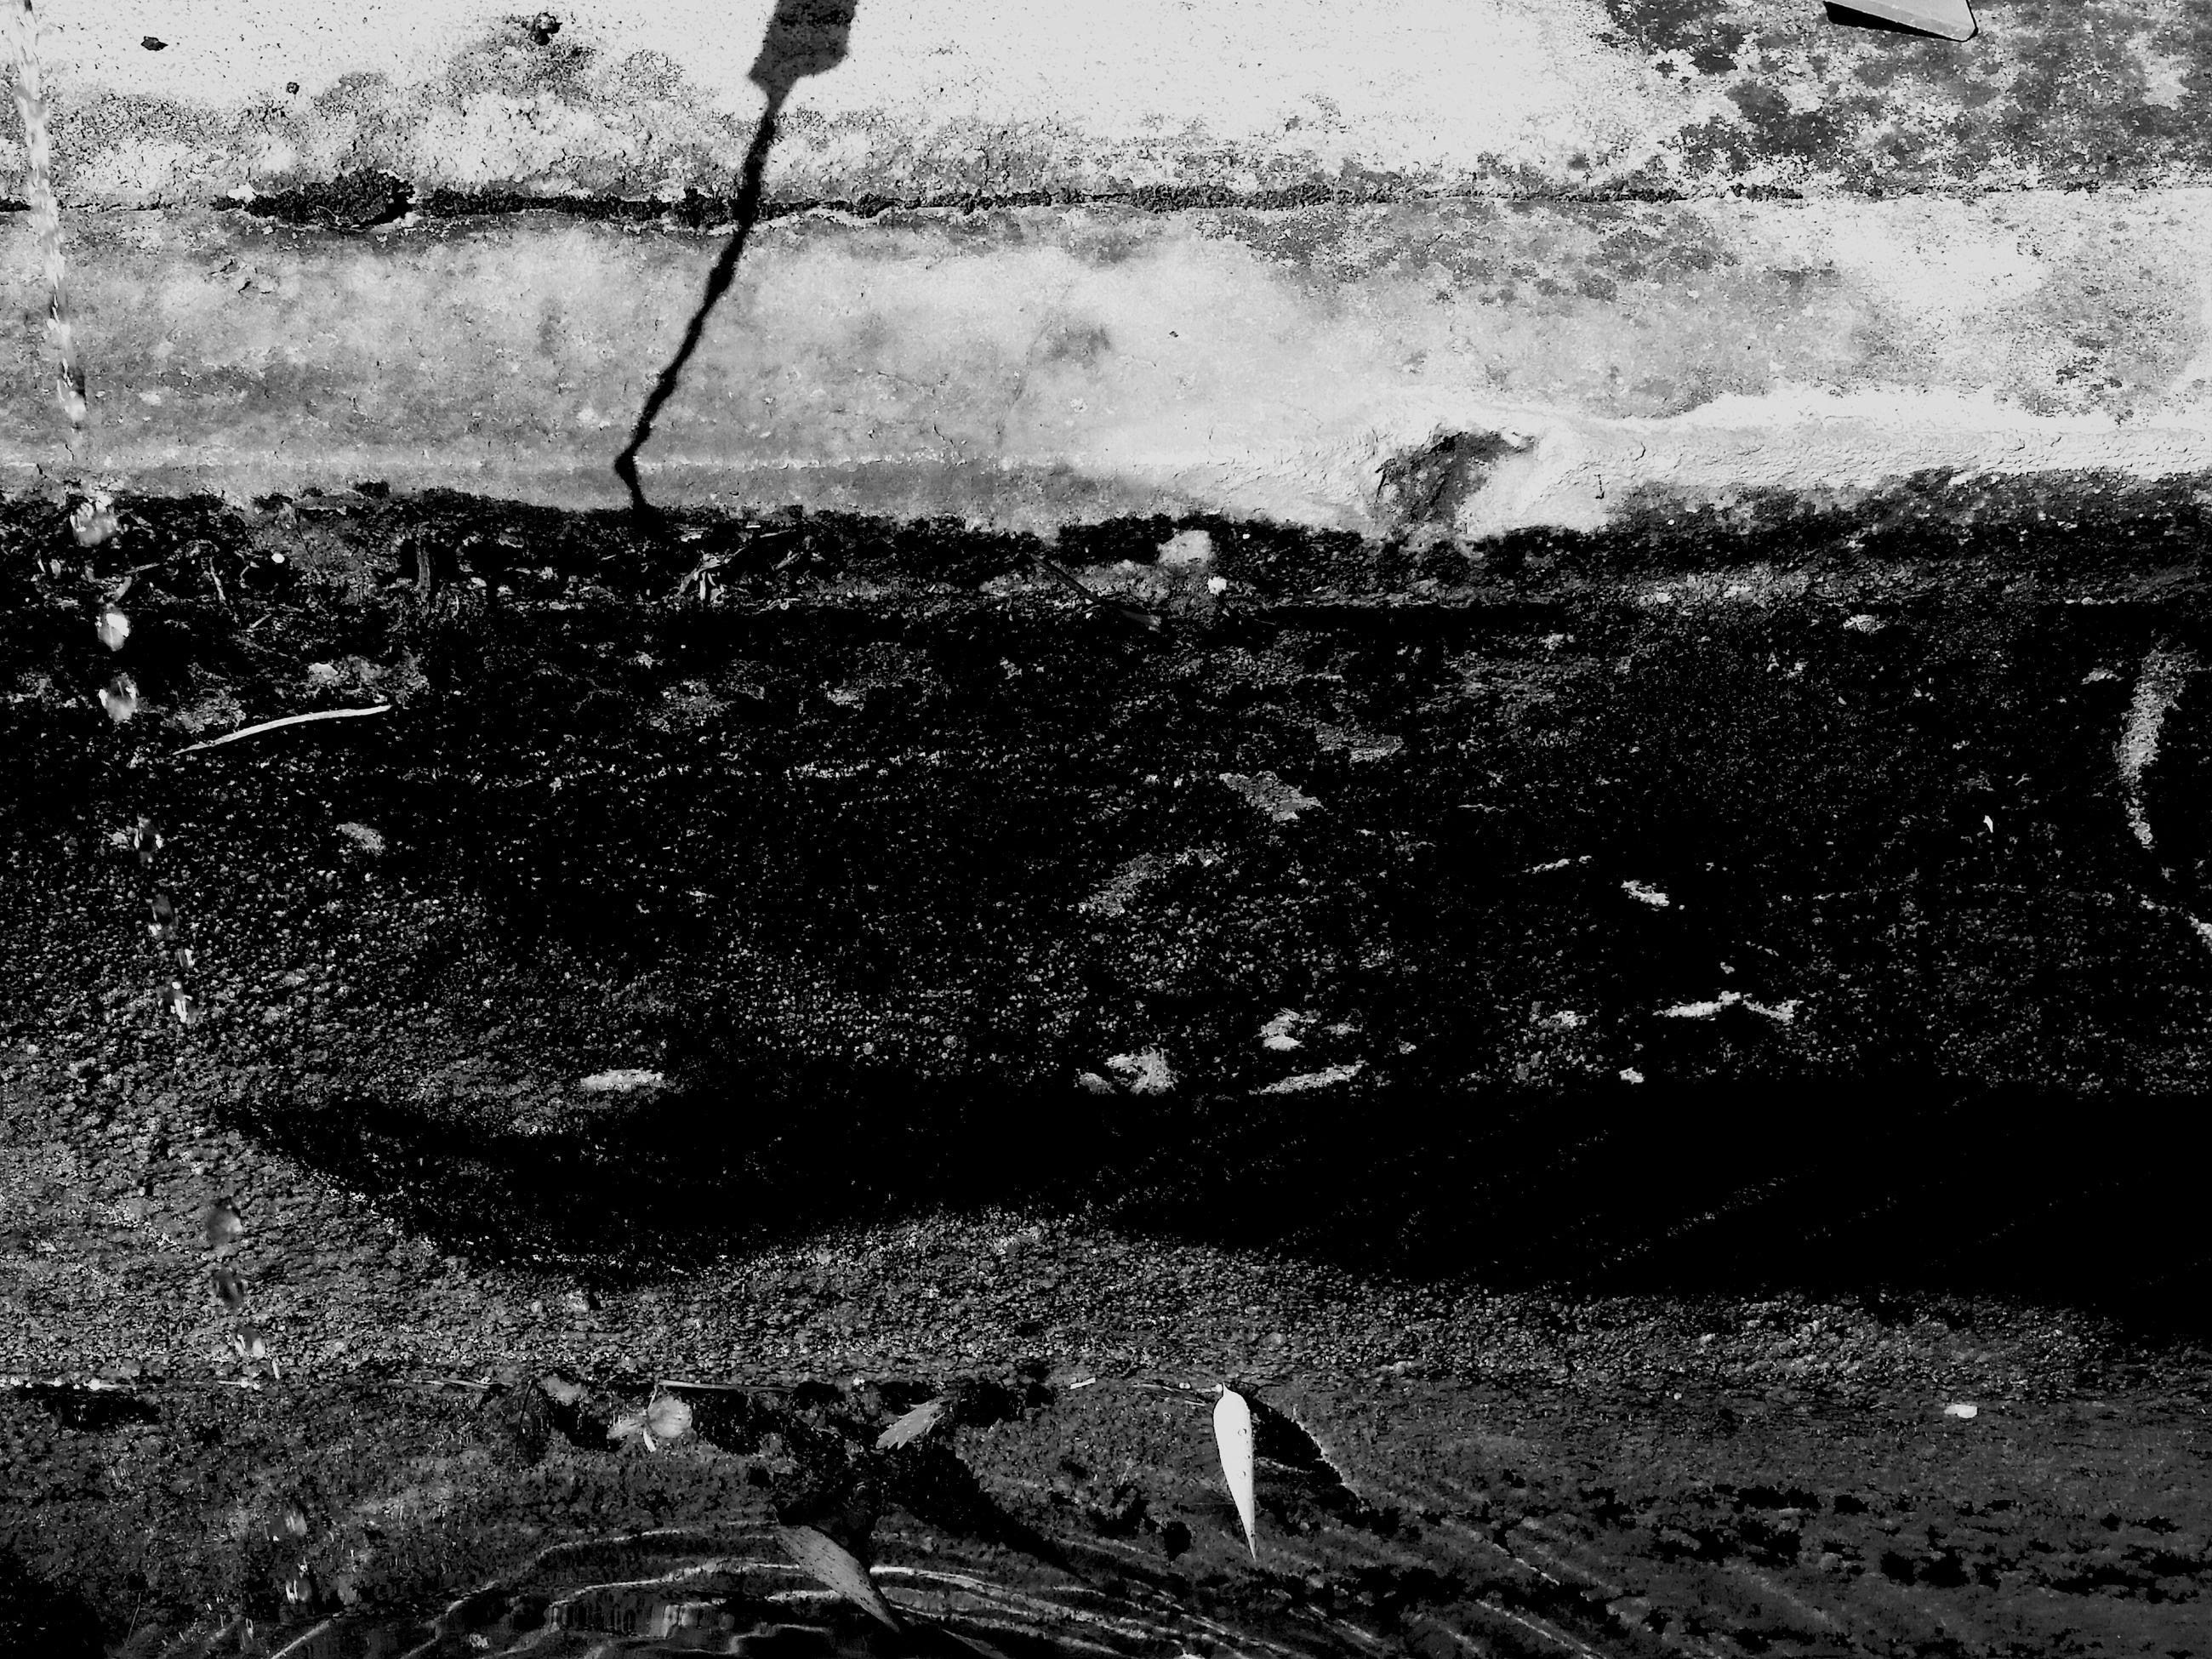 water, wet, rain, drop, window, raindrop, glass - material, season, transparent, weather, monsoon, transportation, day, close-up, indoors, no people, full frame, street, focus on foreground, rainy season